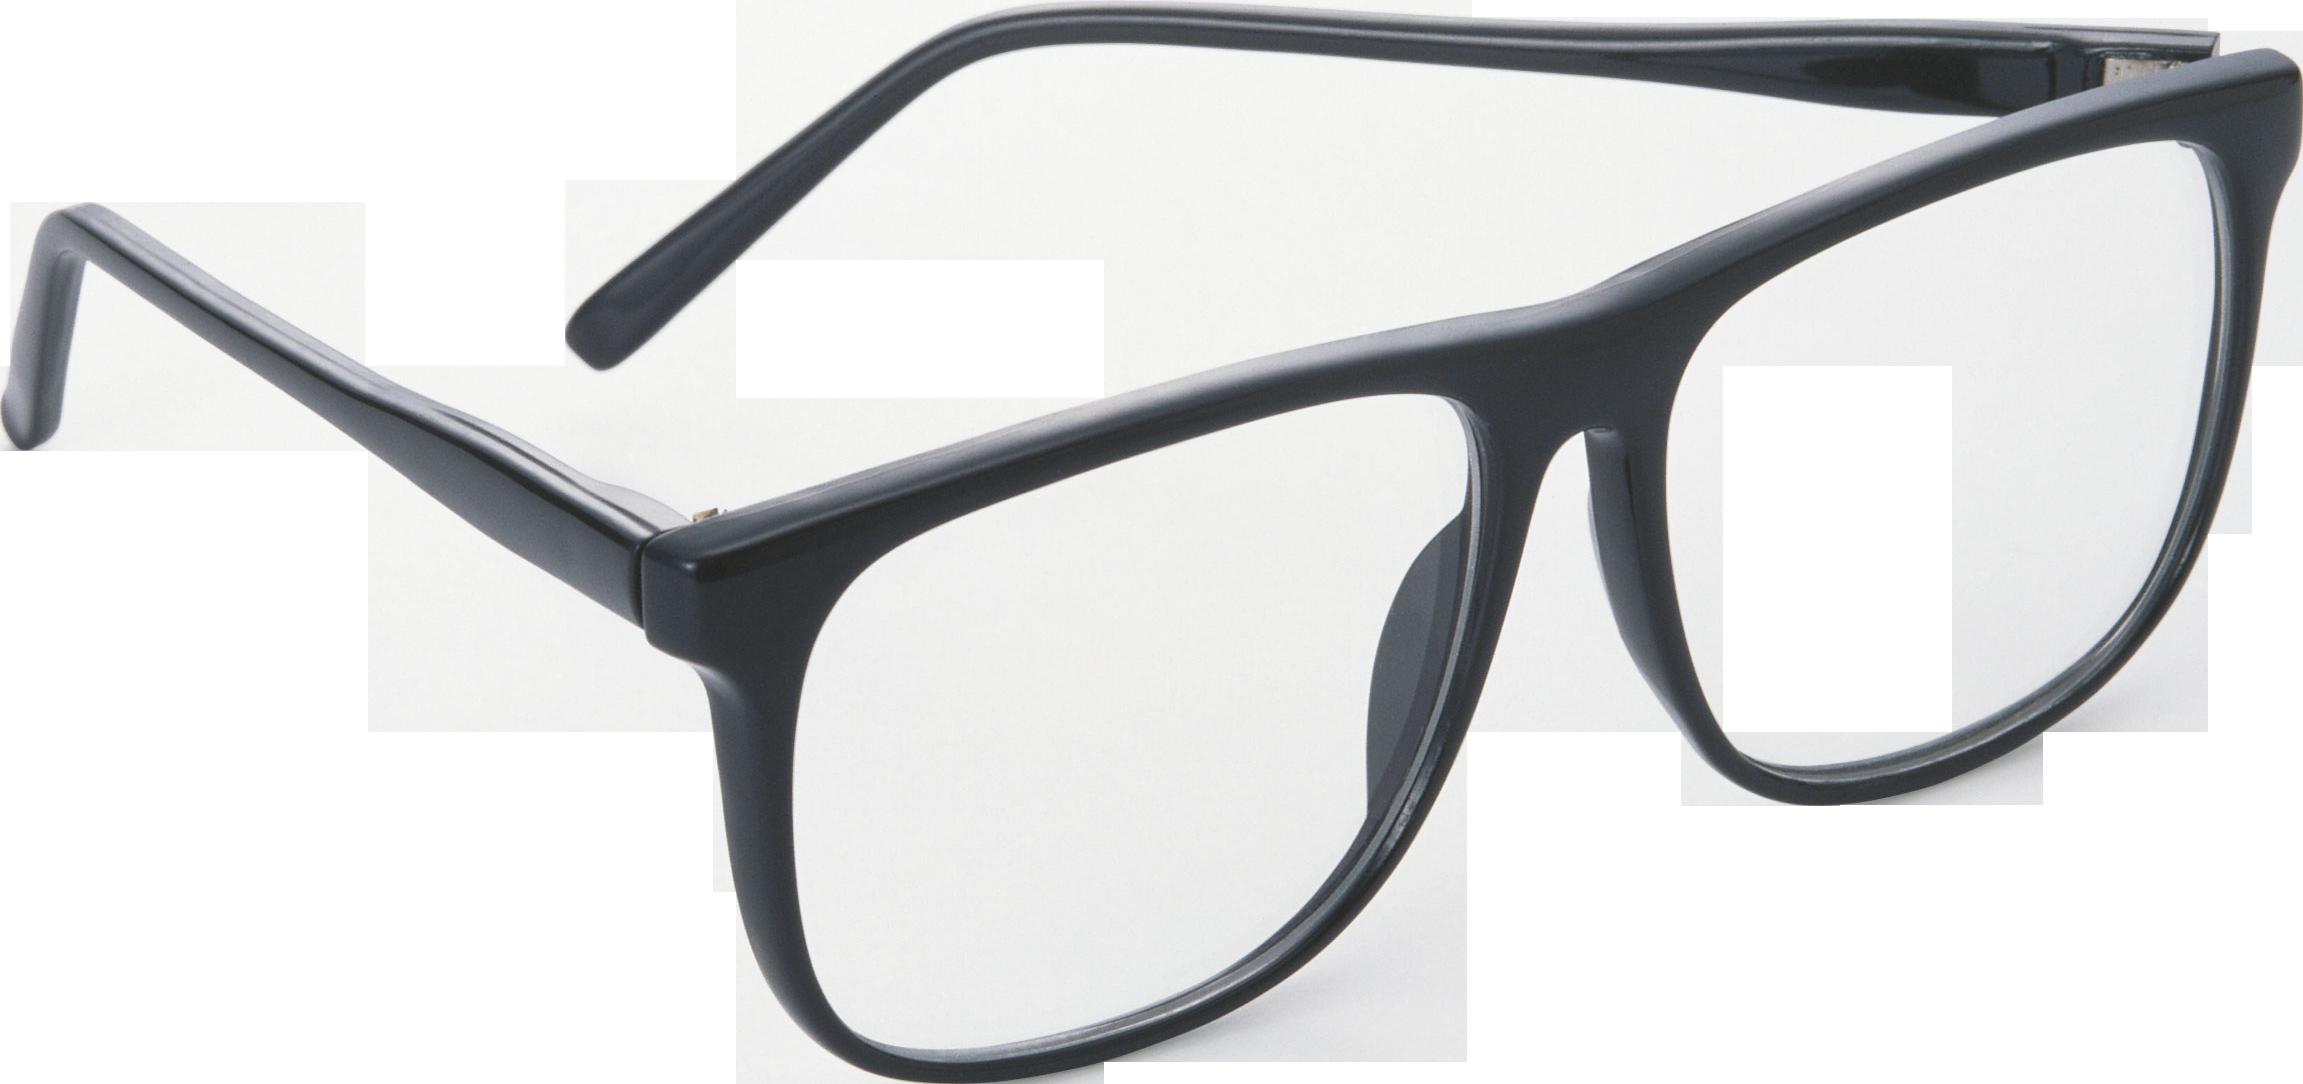 Glasses PNG Image.